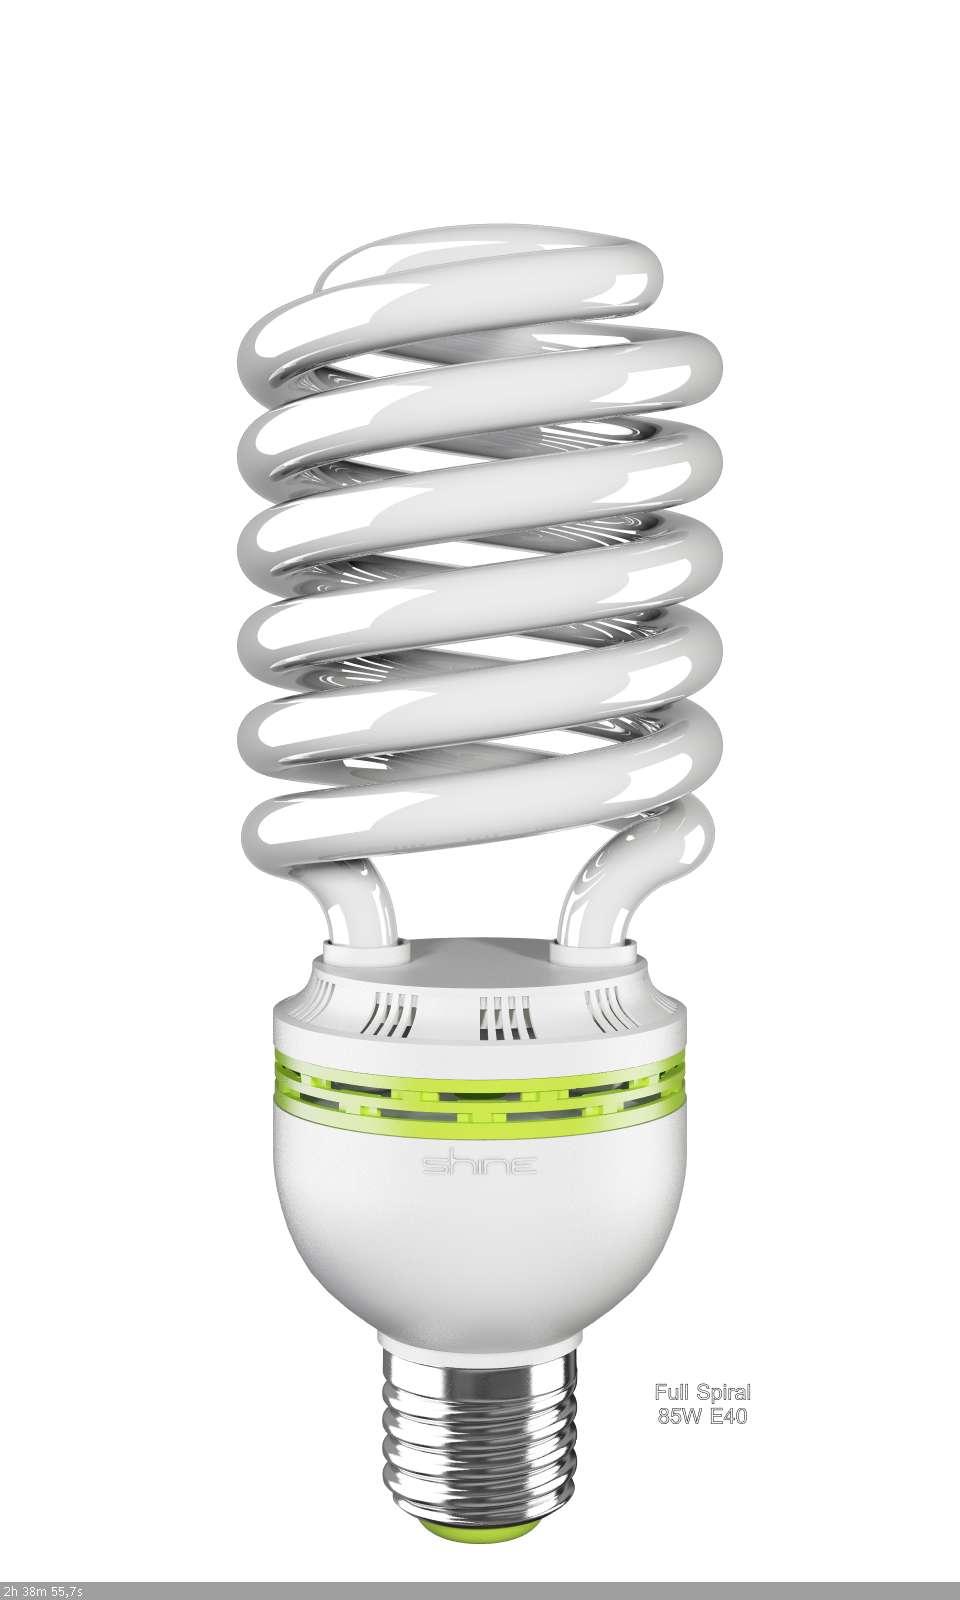 ььЛампа энергосберегающая E40,  85W, Gigalite, 6500K (дневной белый свет), Shine